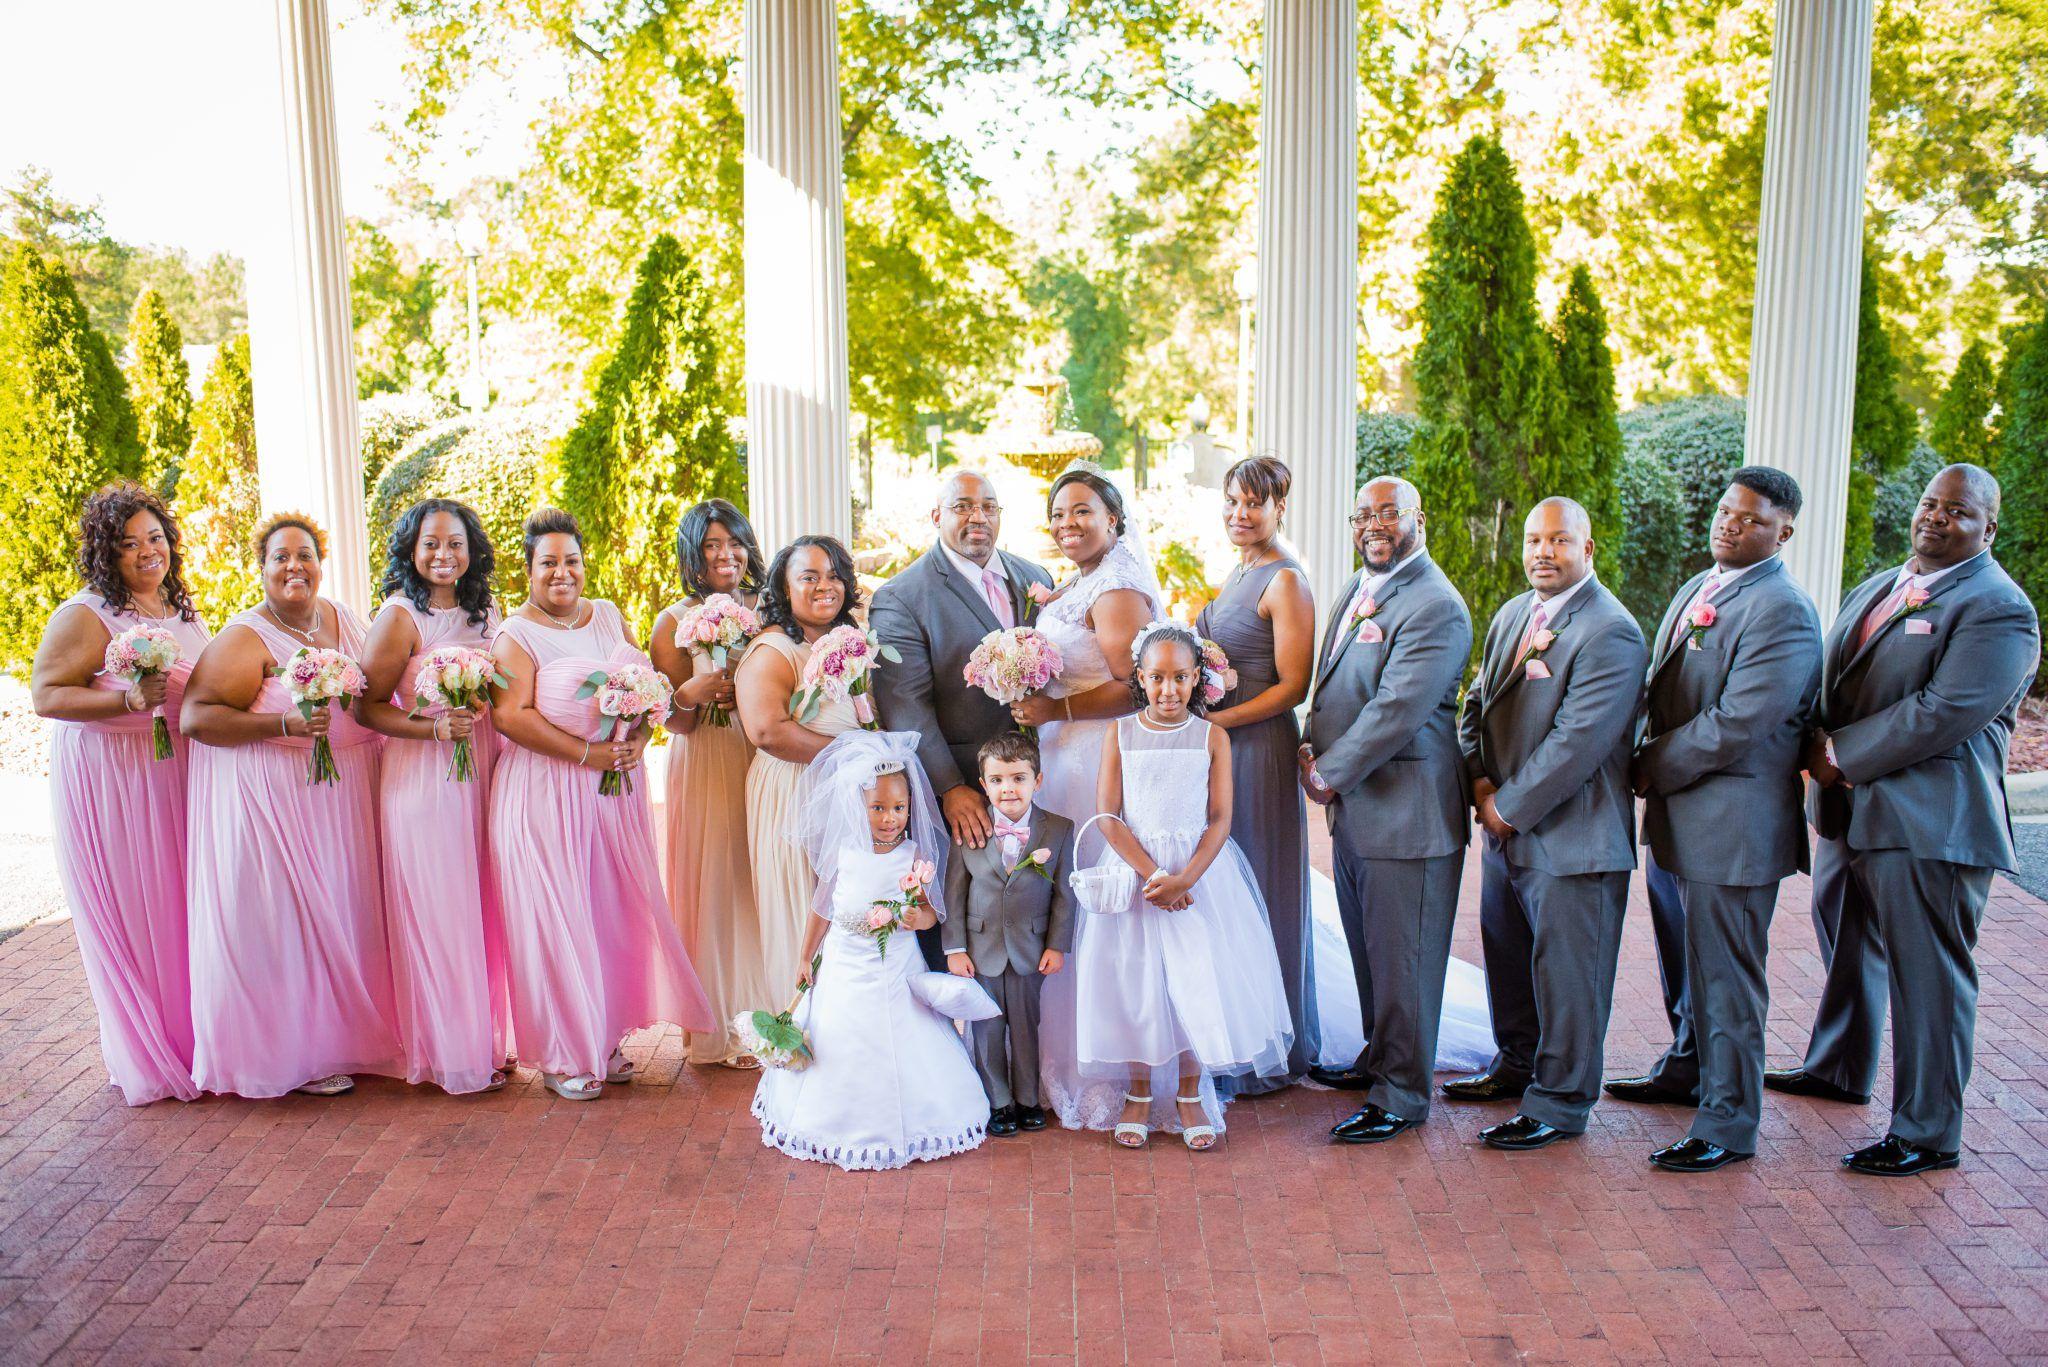 Tuscaloosa Al Nuptials Southern Belle Wedding Sweet Home Alabama African American Weddings